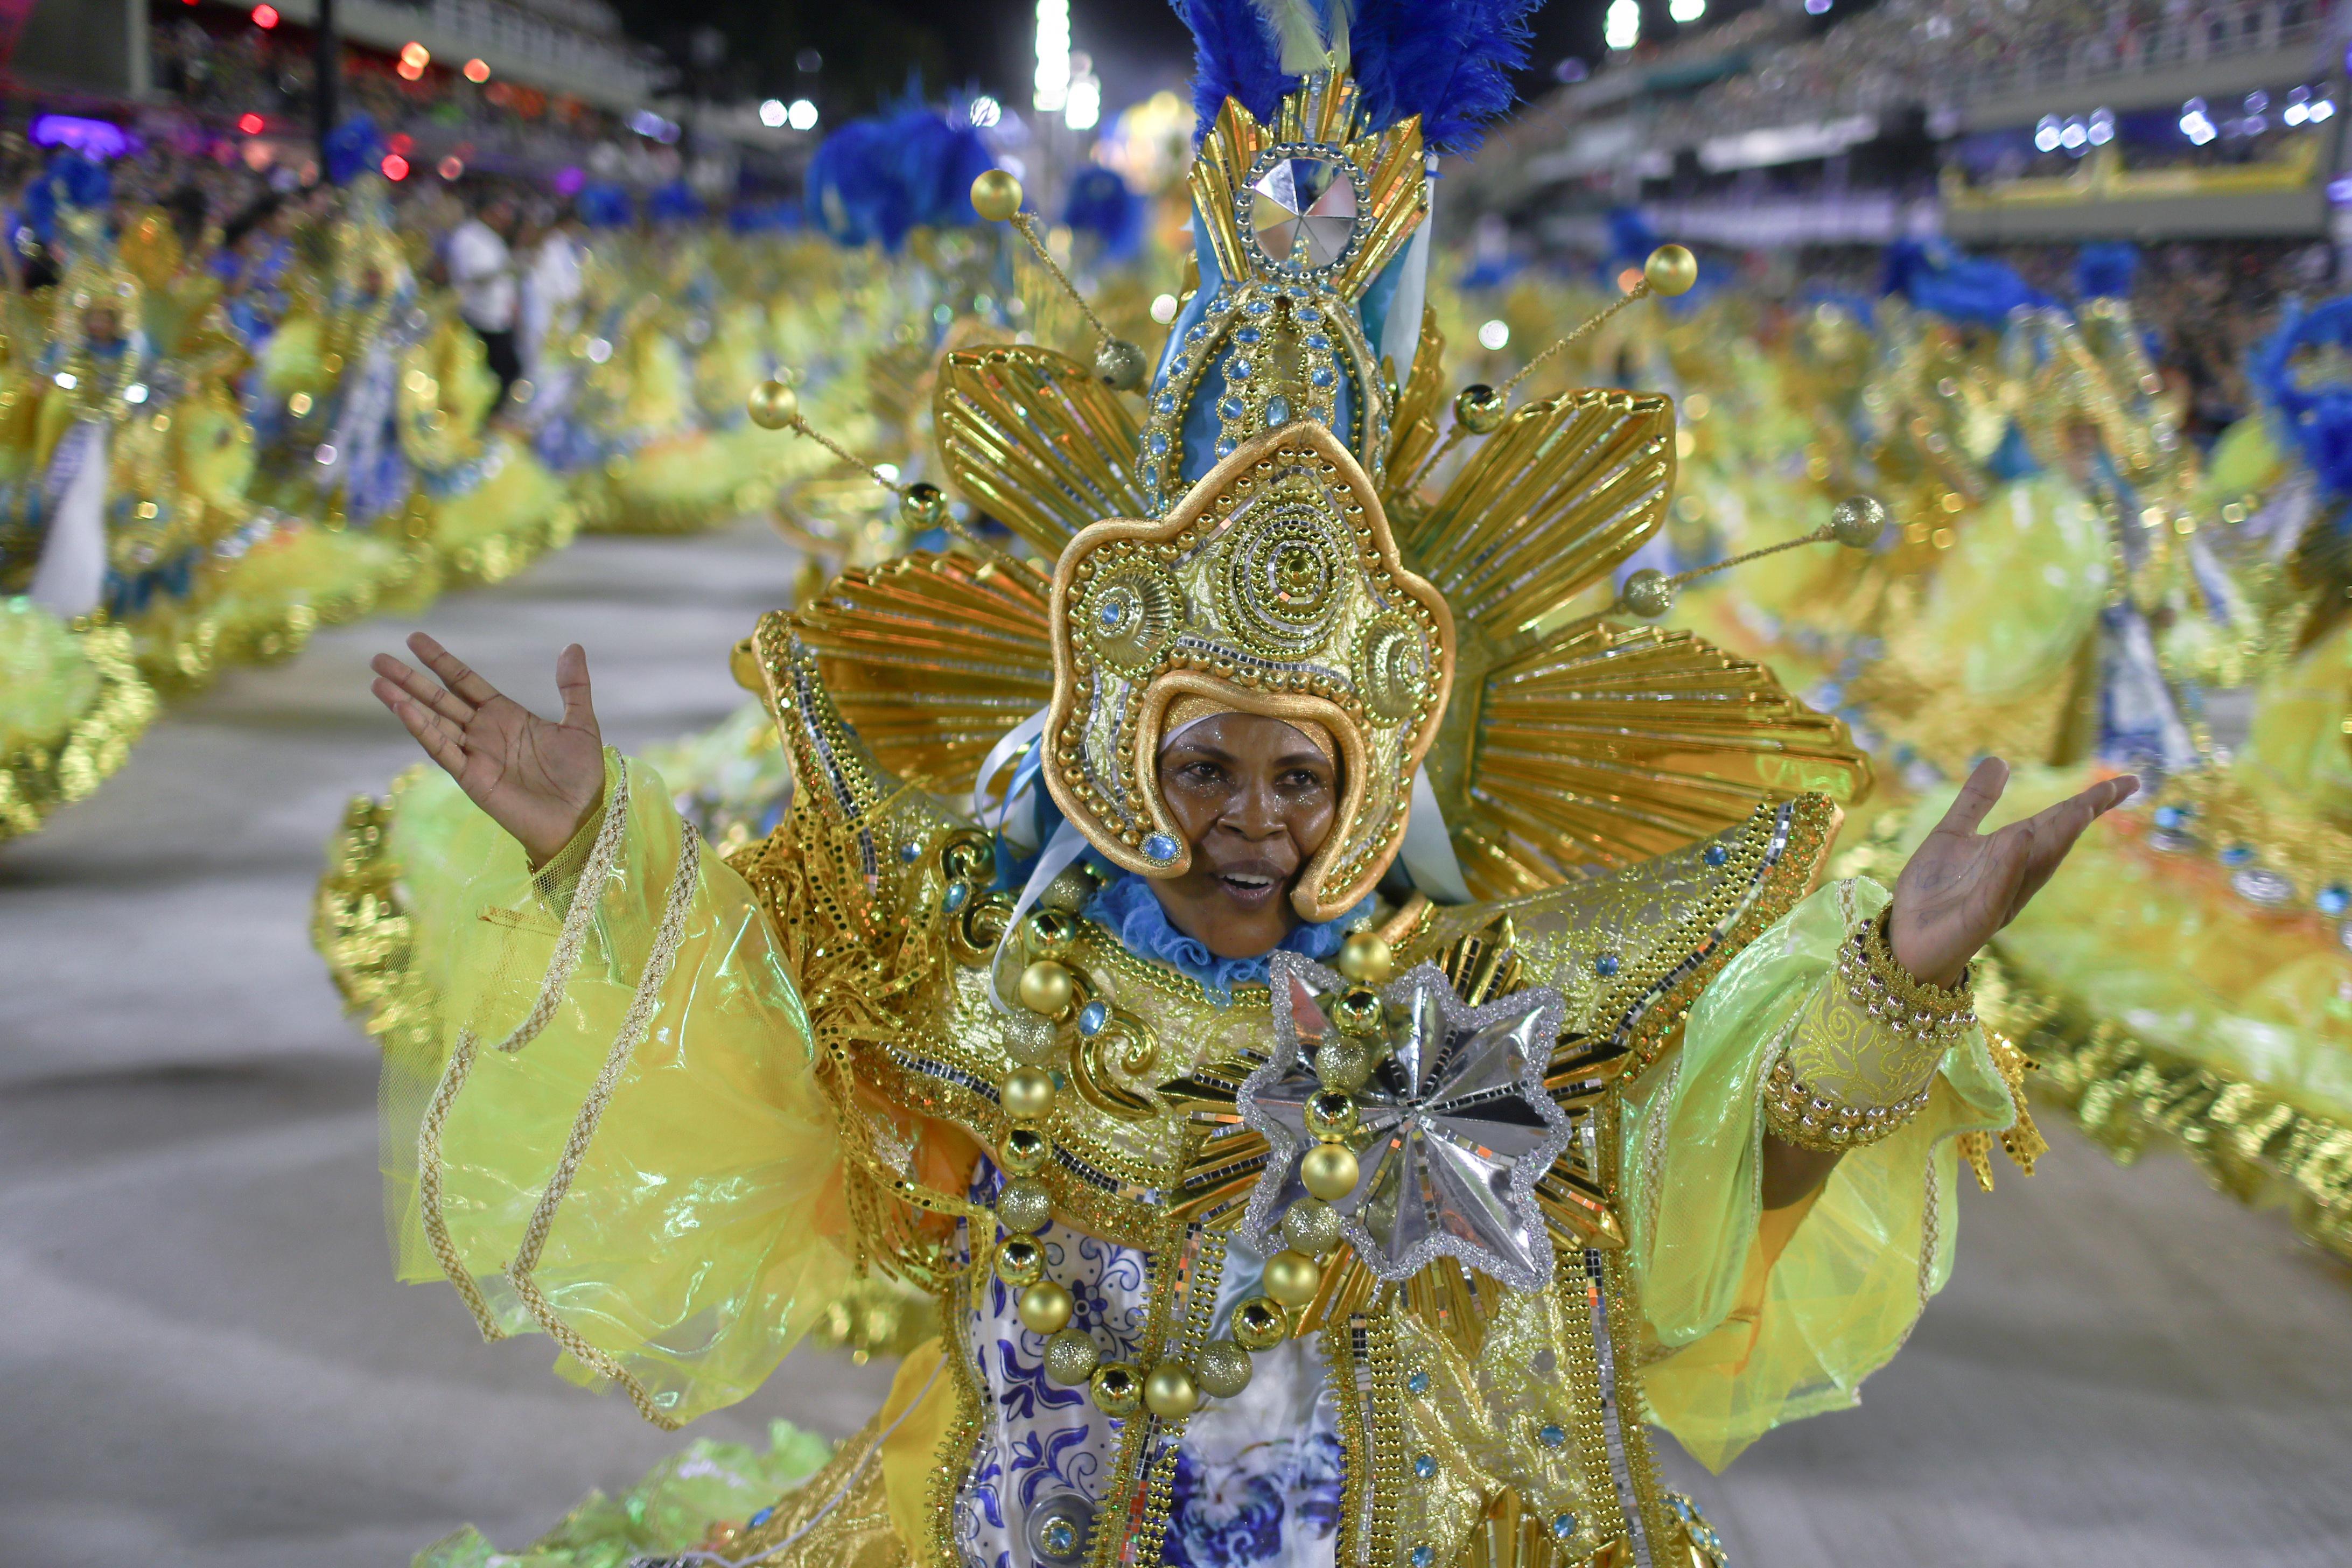 Una bailarina de Paraiso do Tuiuti (REUTERS/Pilar Olivares)